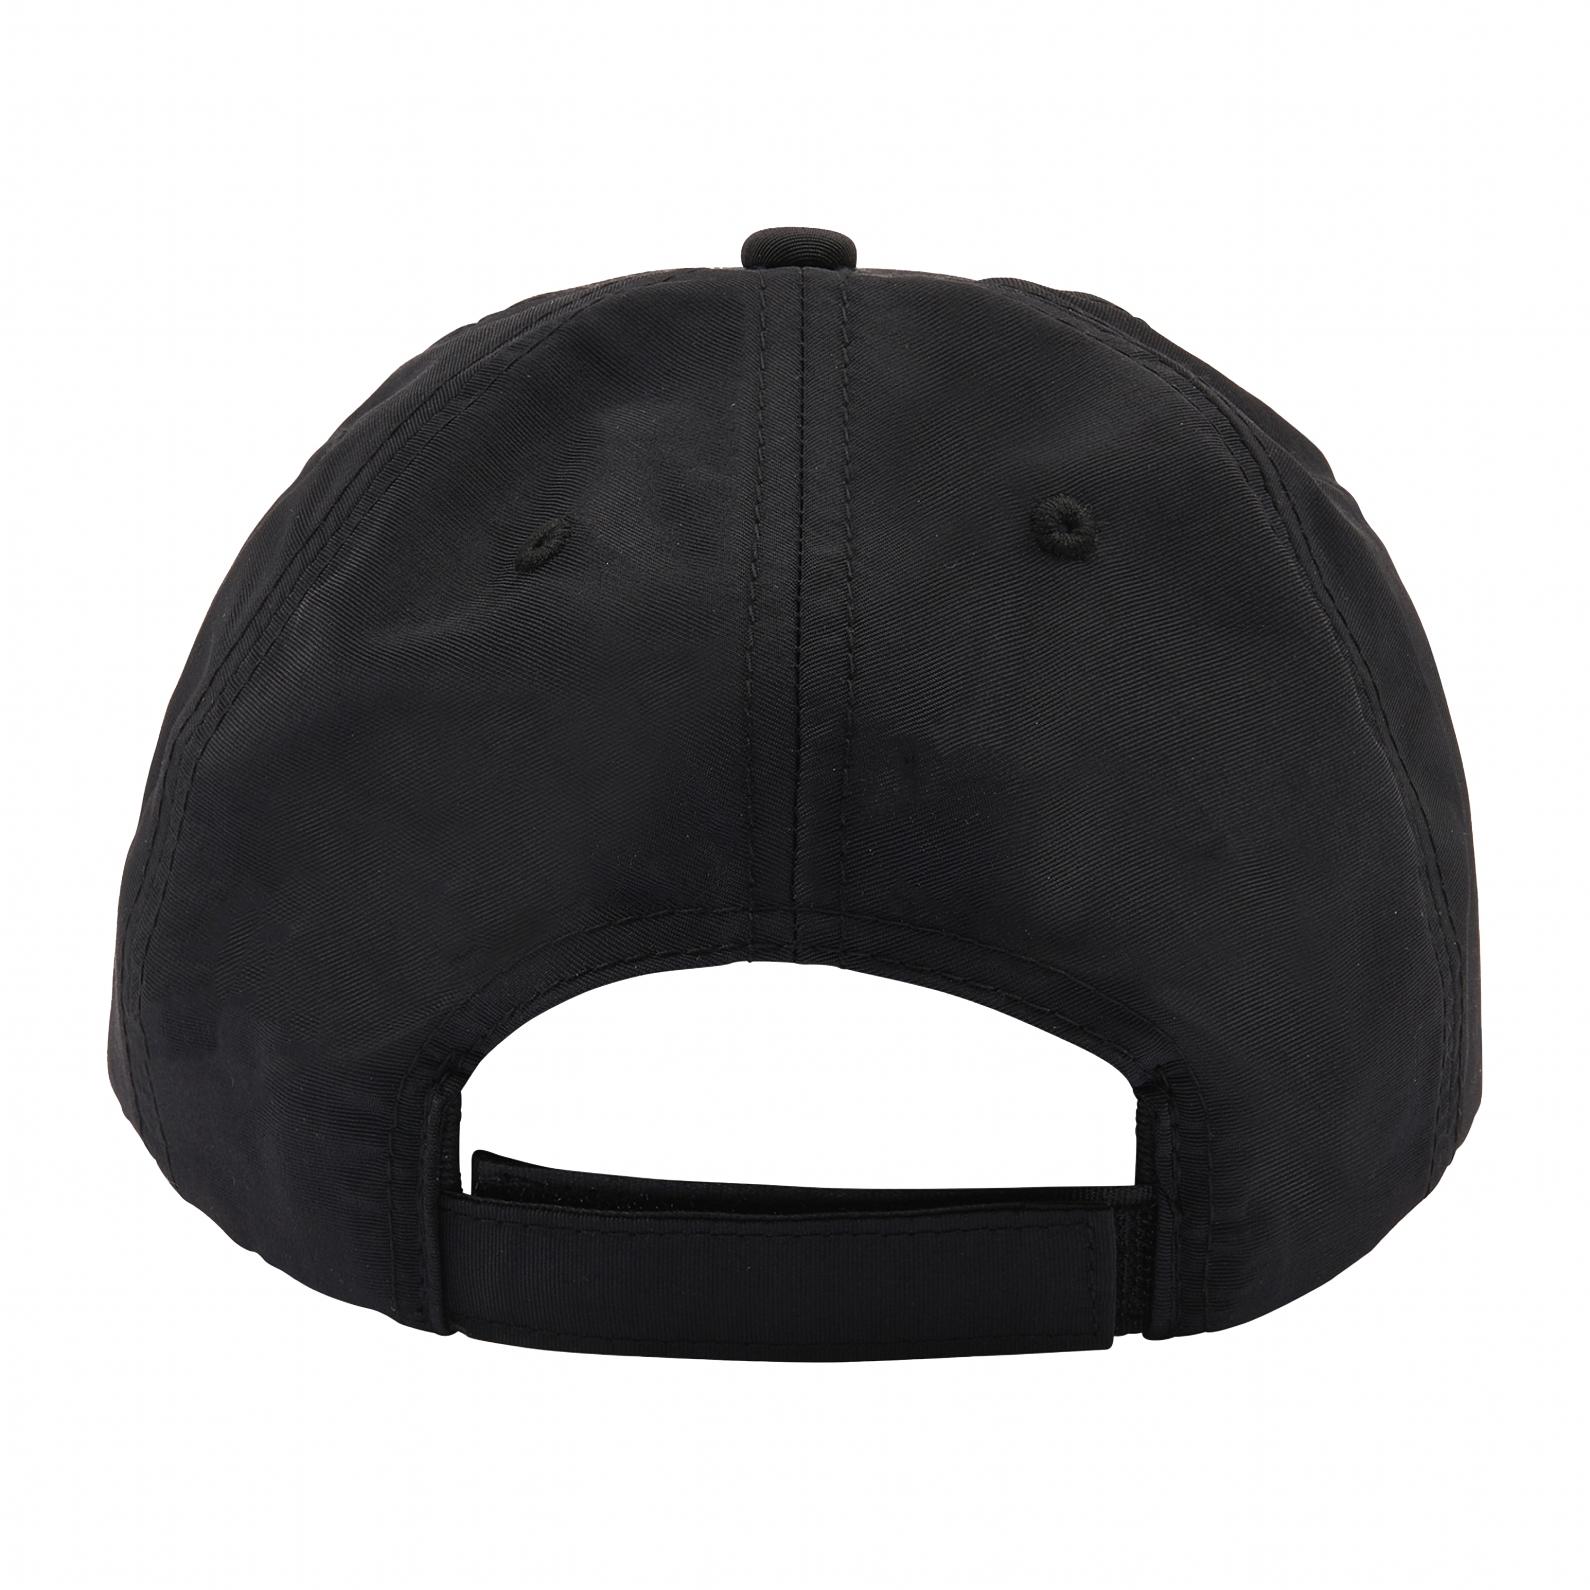 【PLEASURES/プレジャーズ】HUMP NYLON SPORT CAP キャップ / BLACK